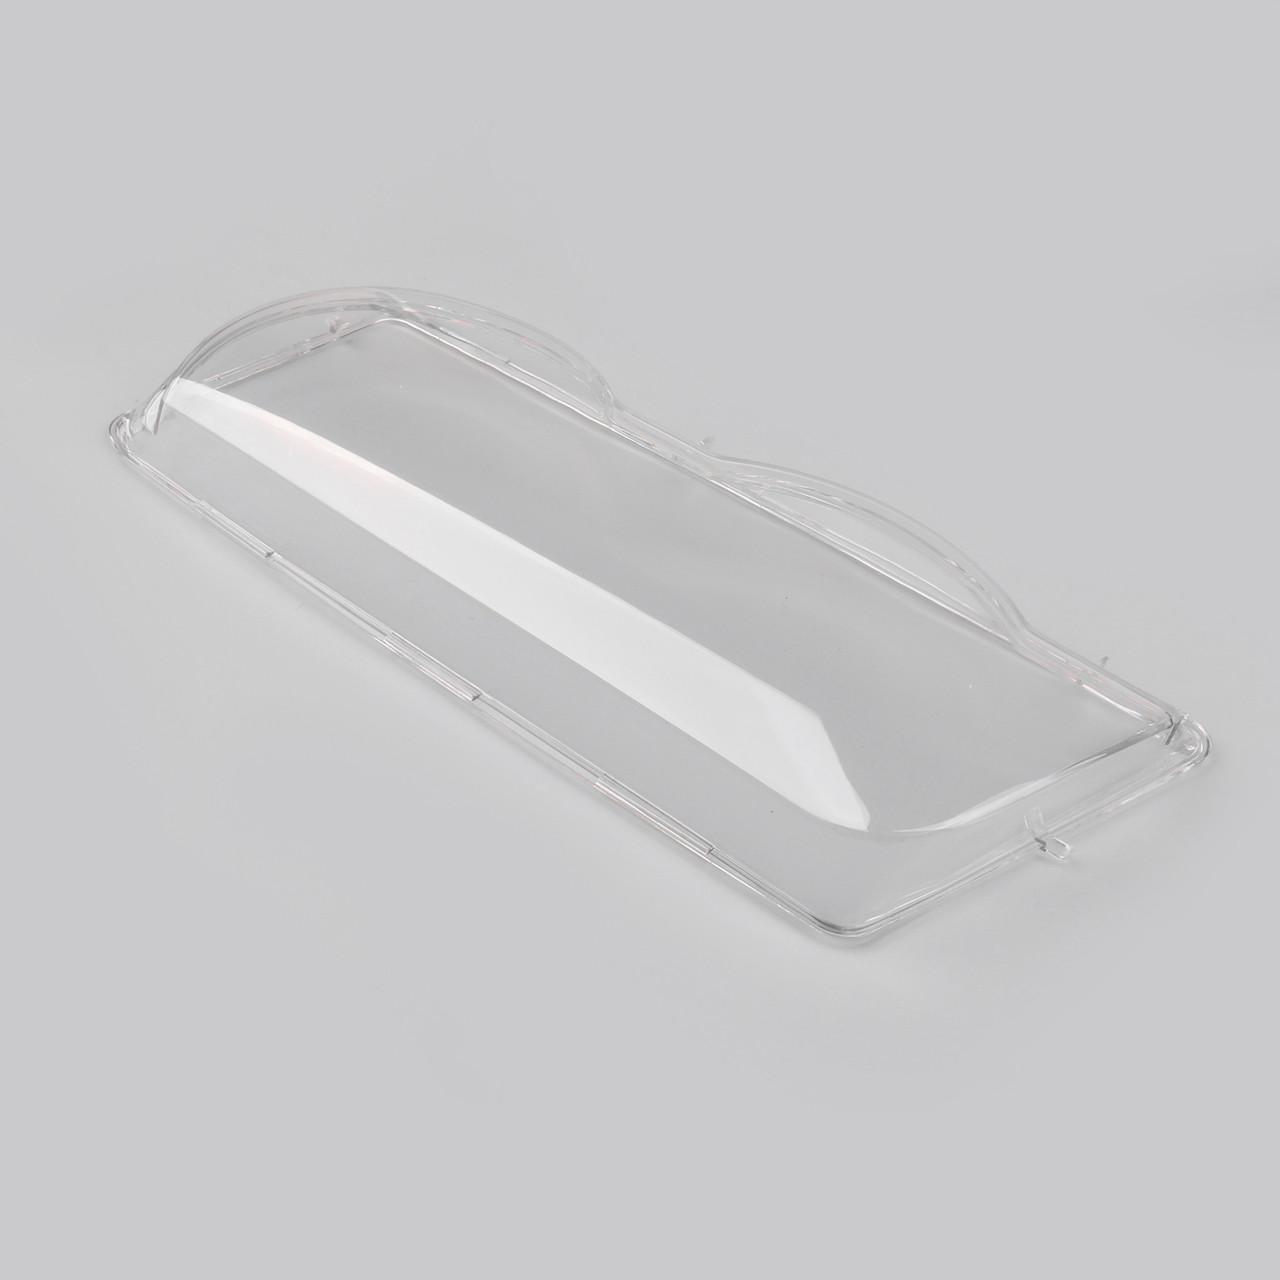 Car Clear Headlight Headlamp Lens Cover Shell Left For BMW E38 (1999-2001)